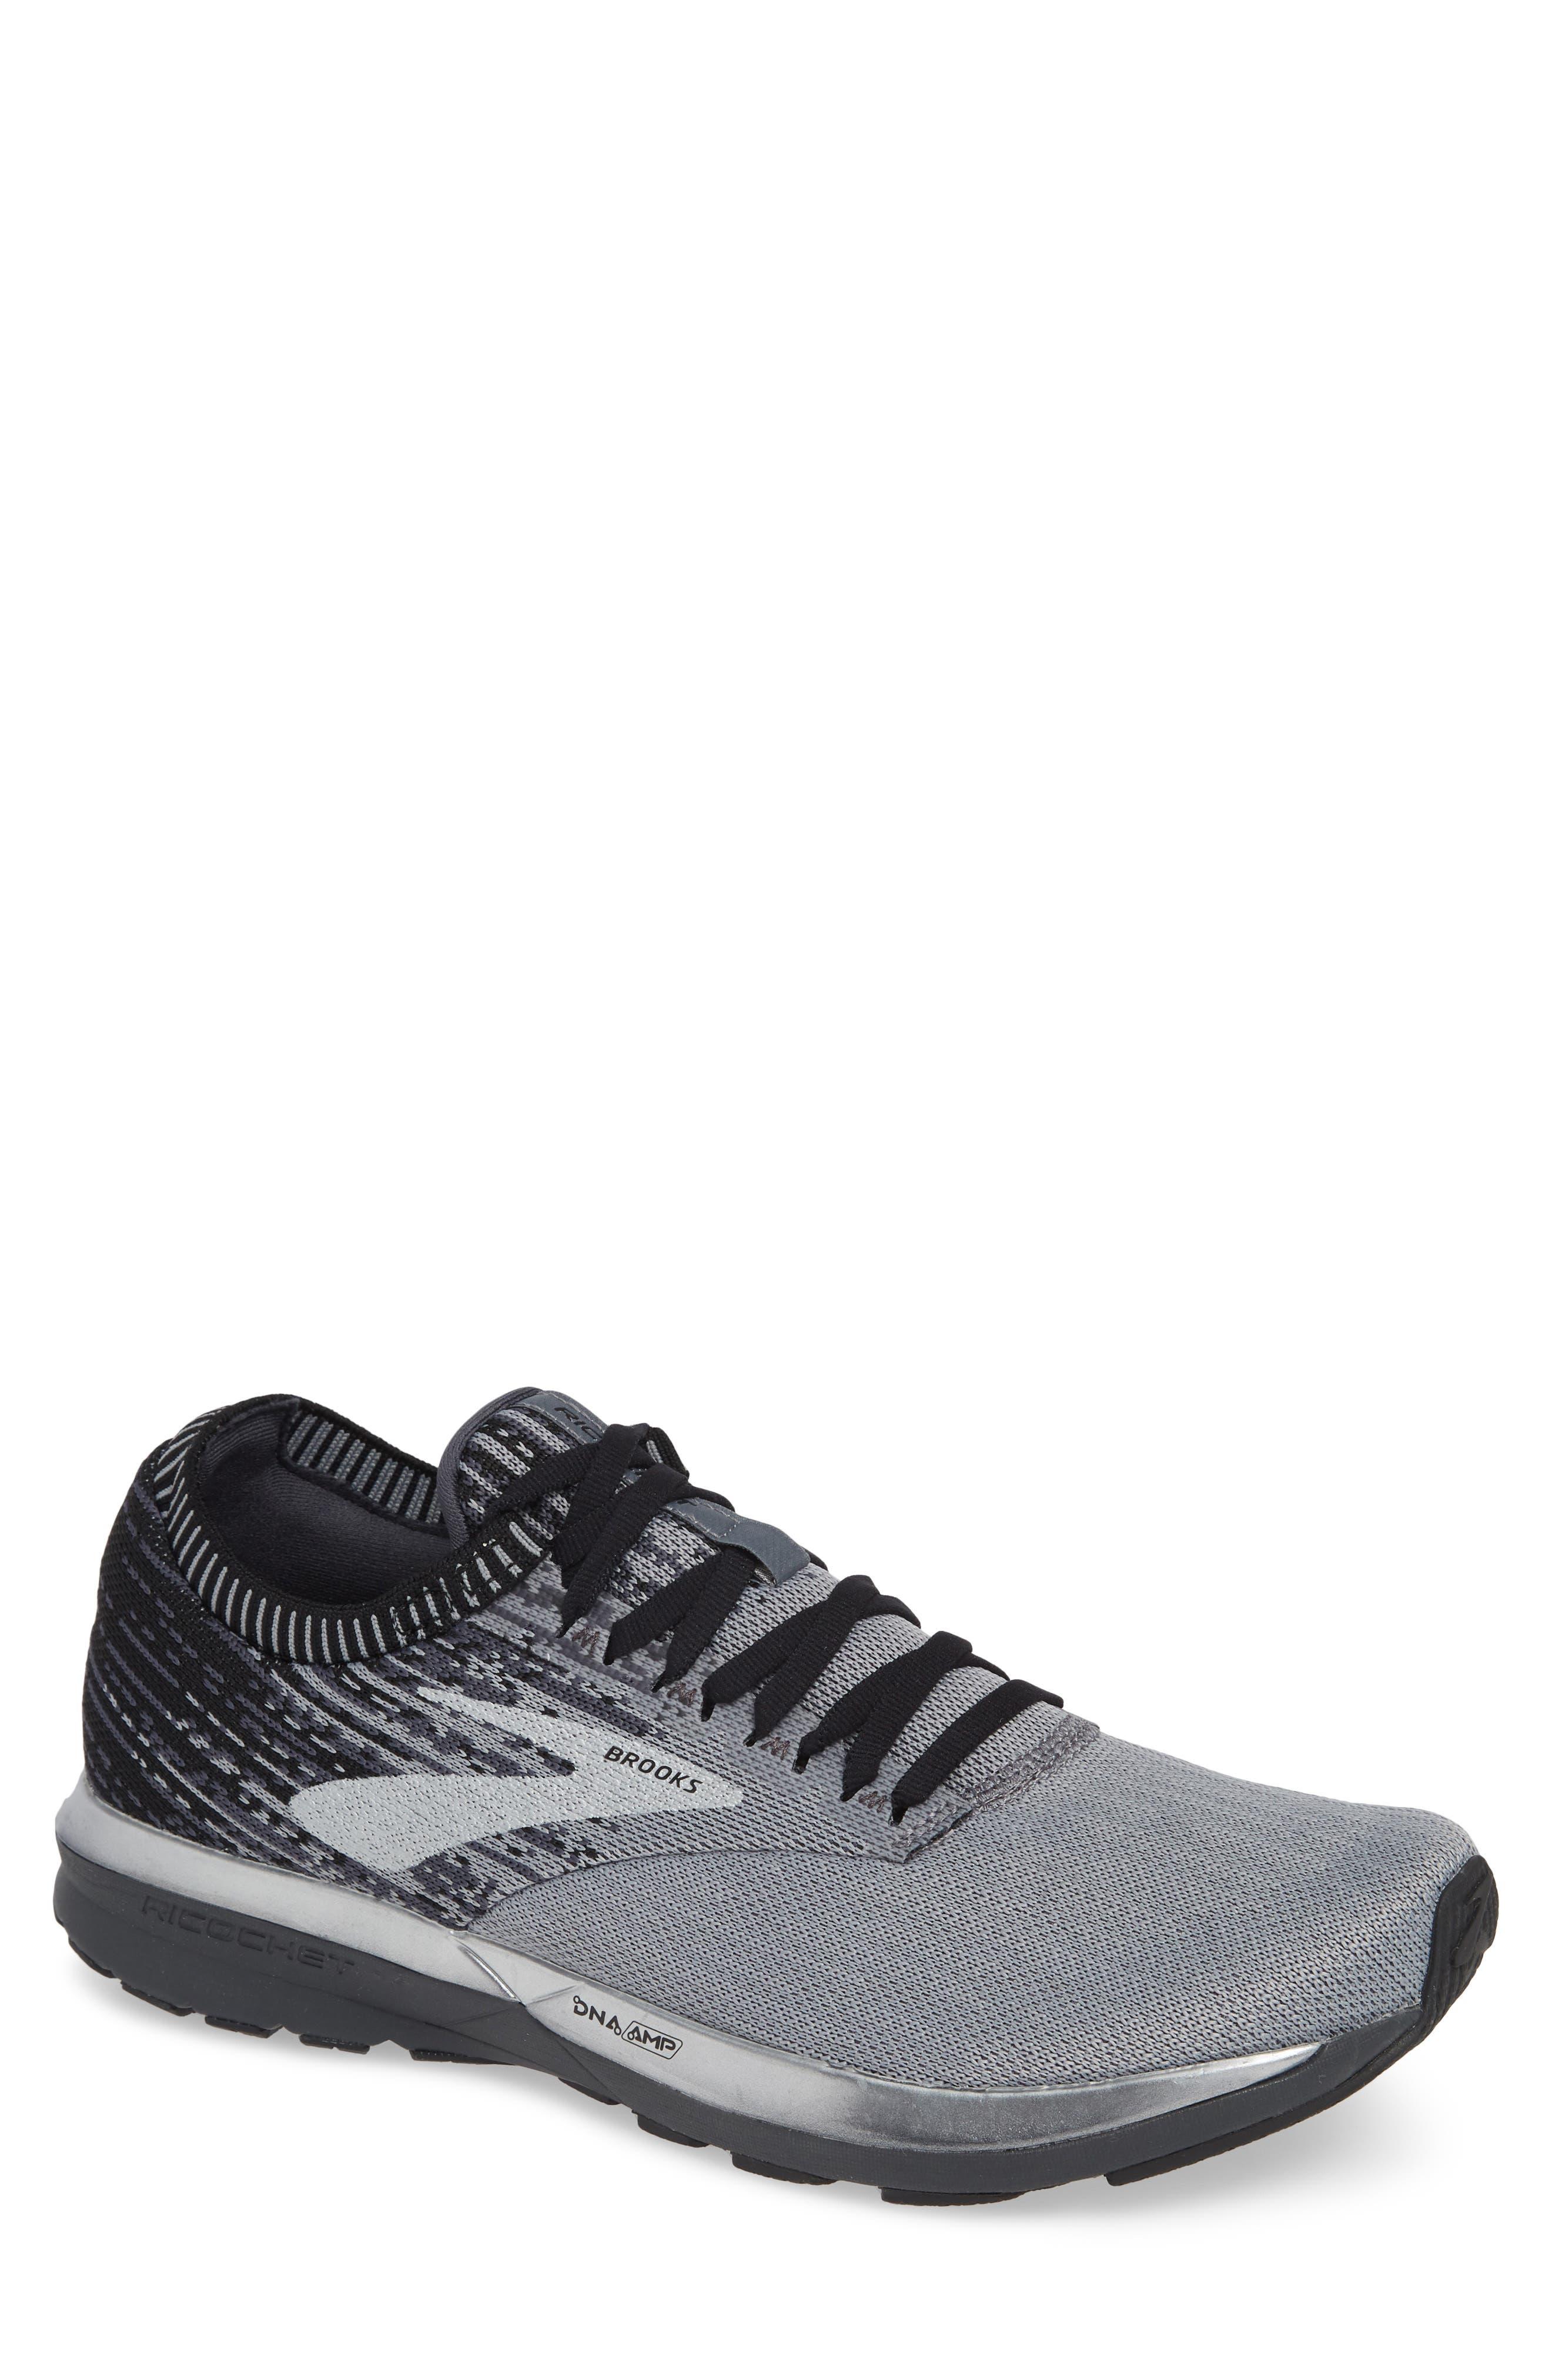 Brooks Ricochet Running Shoe - Grey